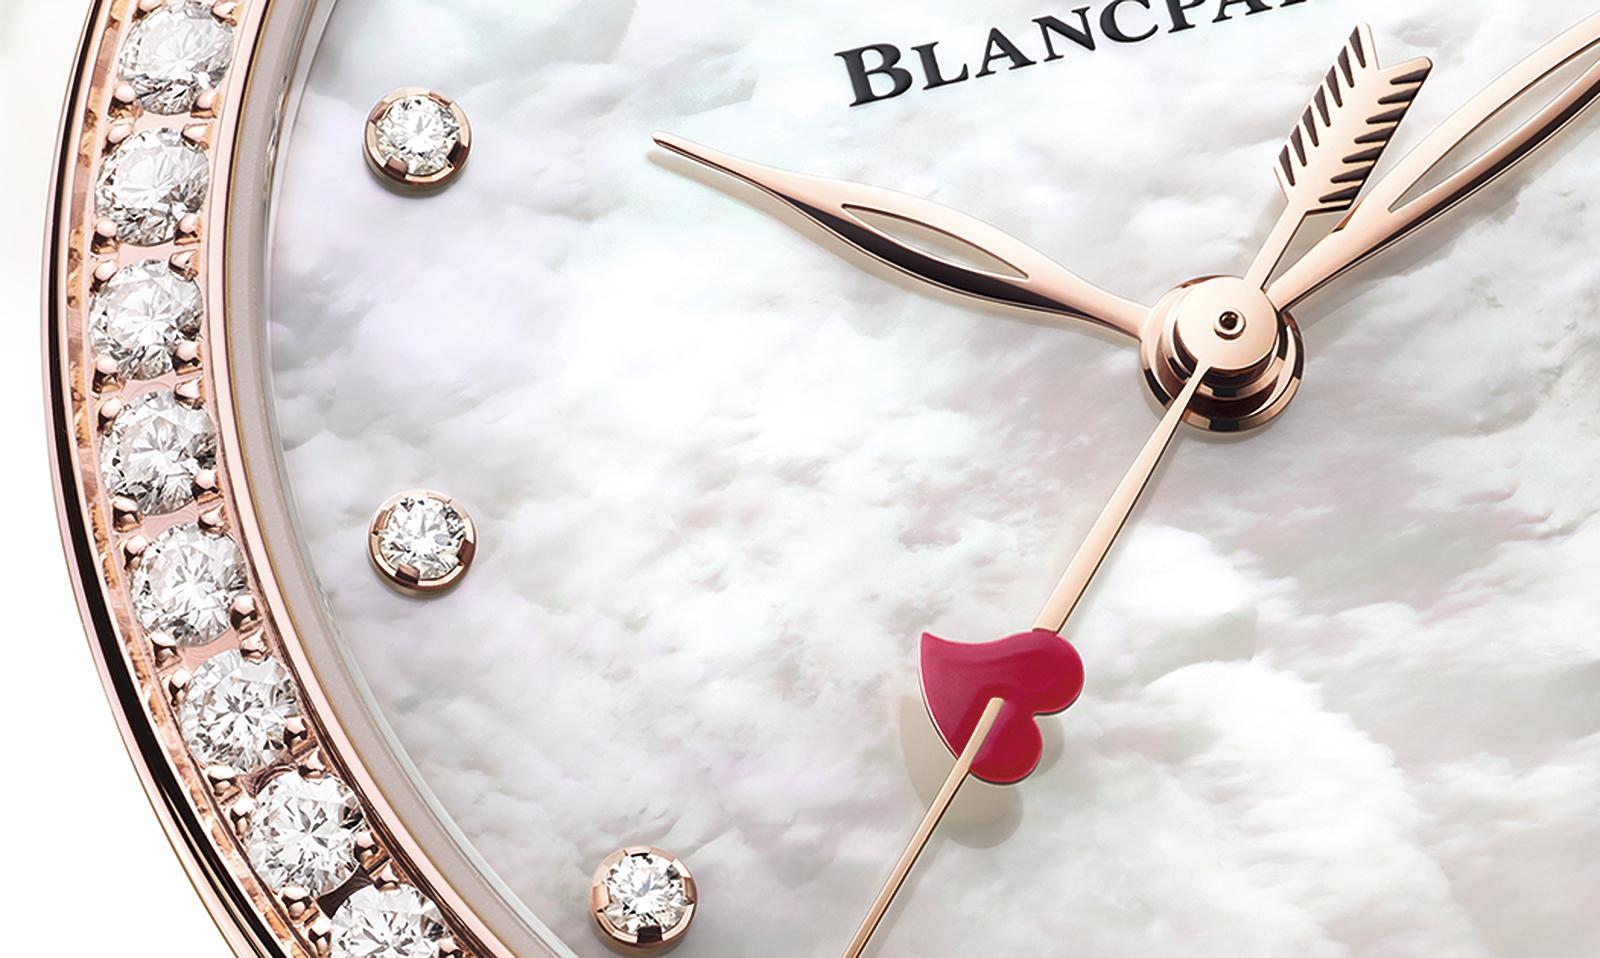 Blancpain Villeret Women Date Saint-Valentin 2021